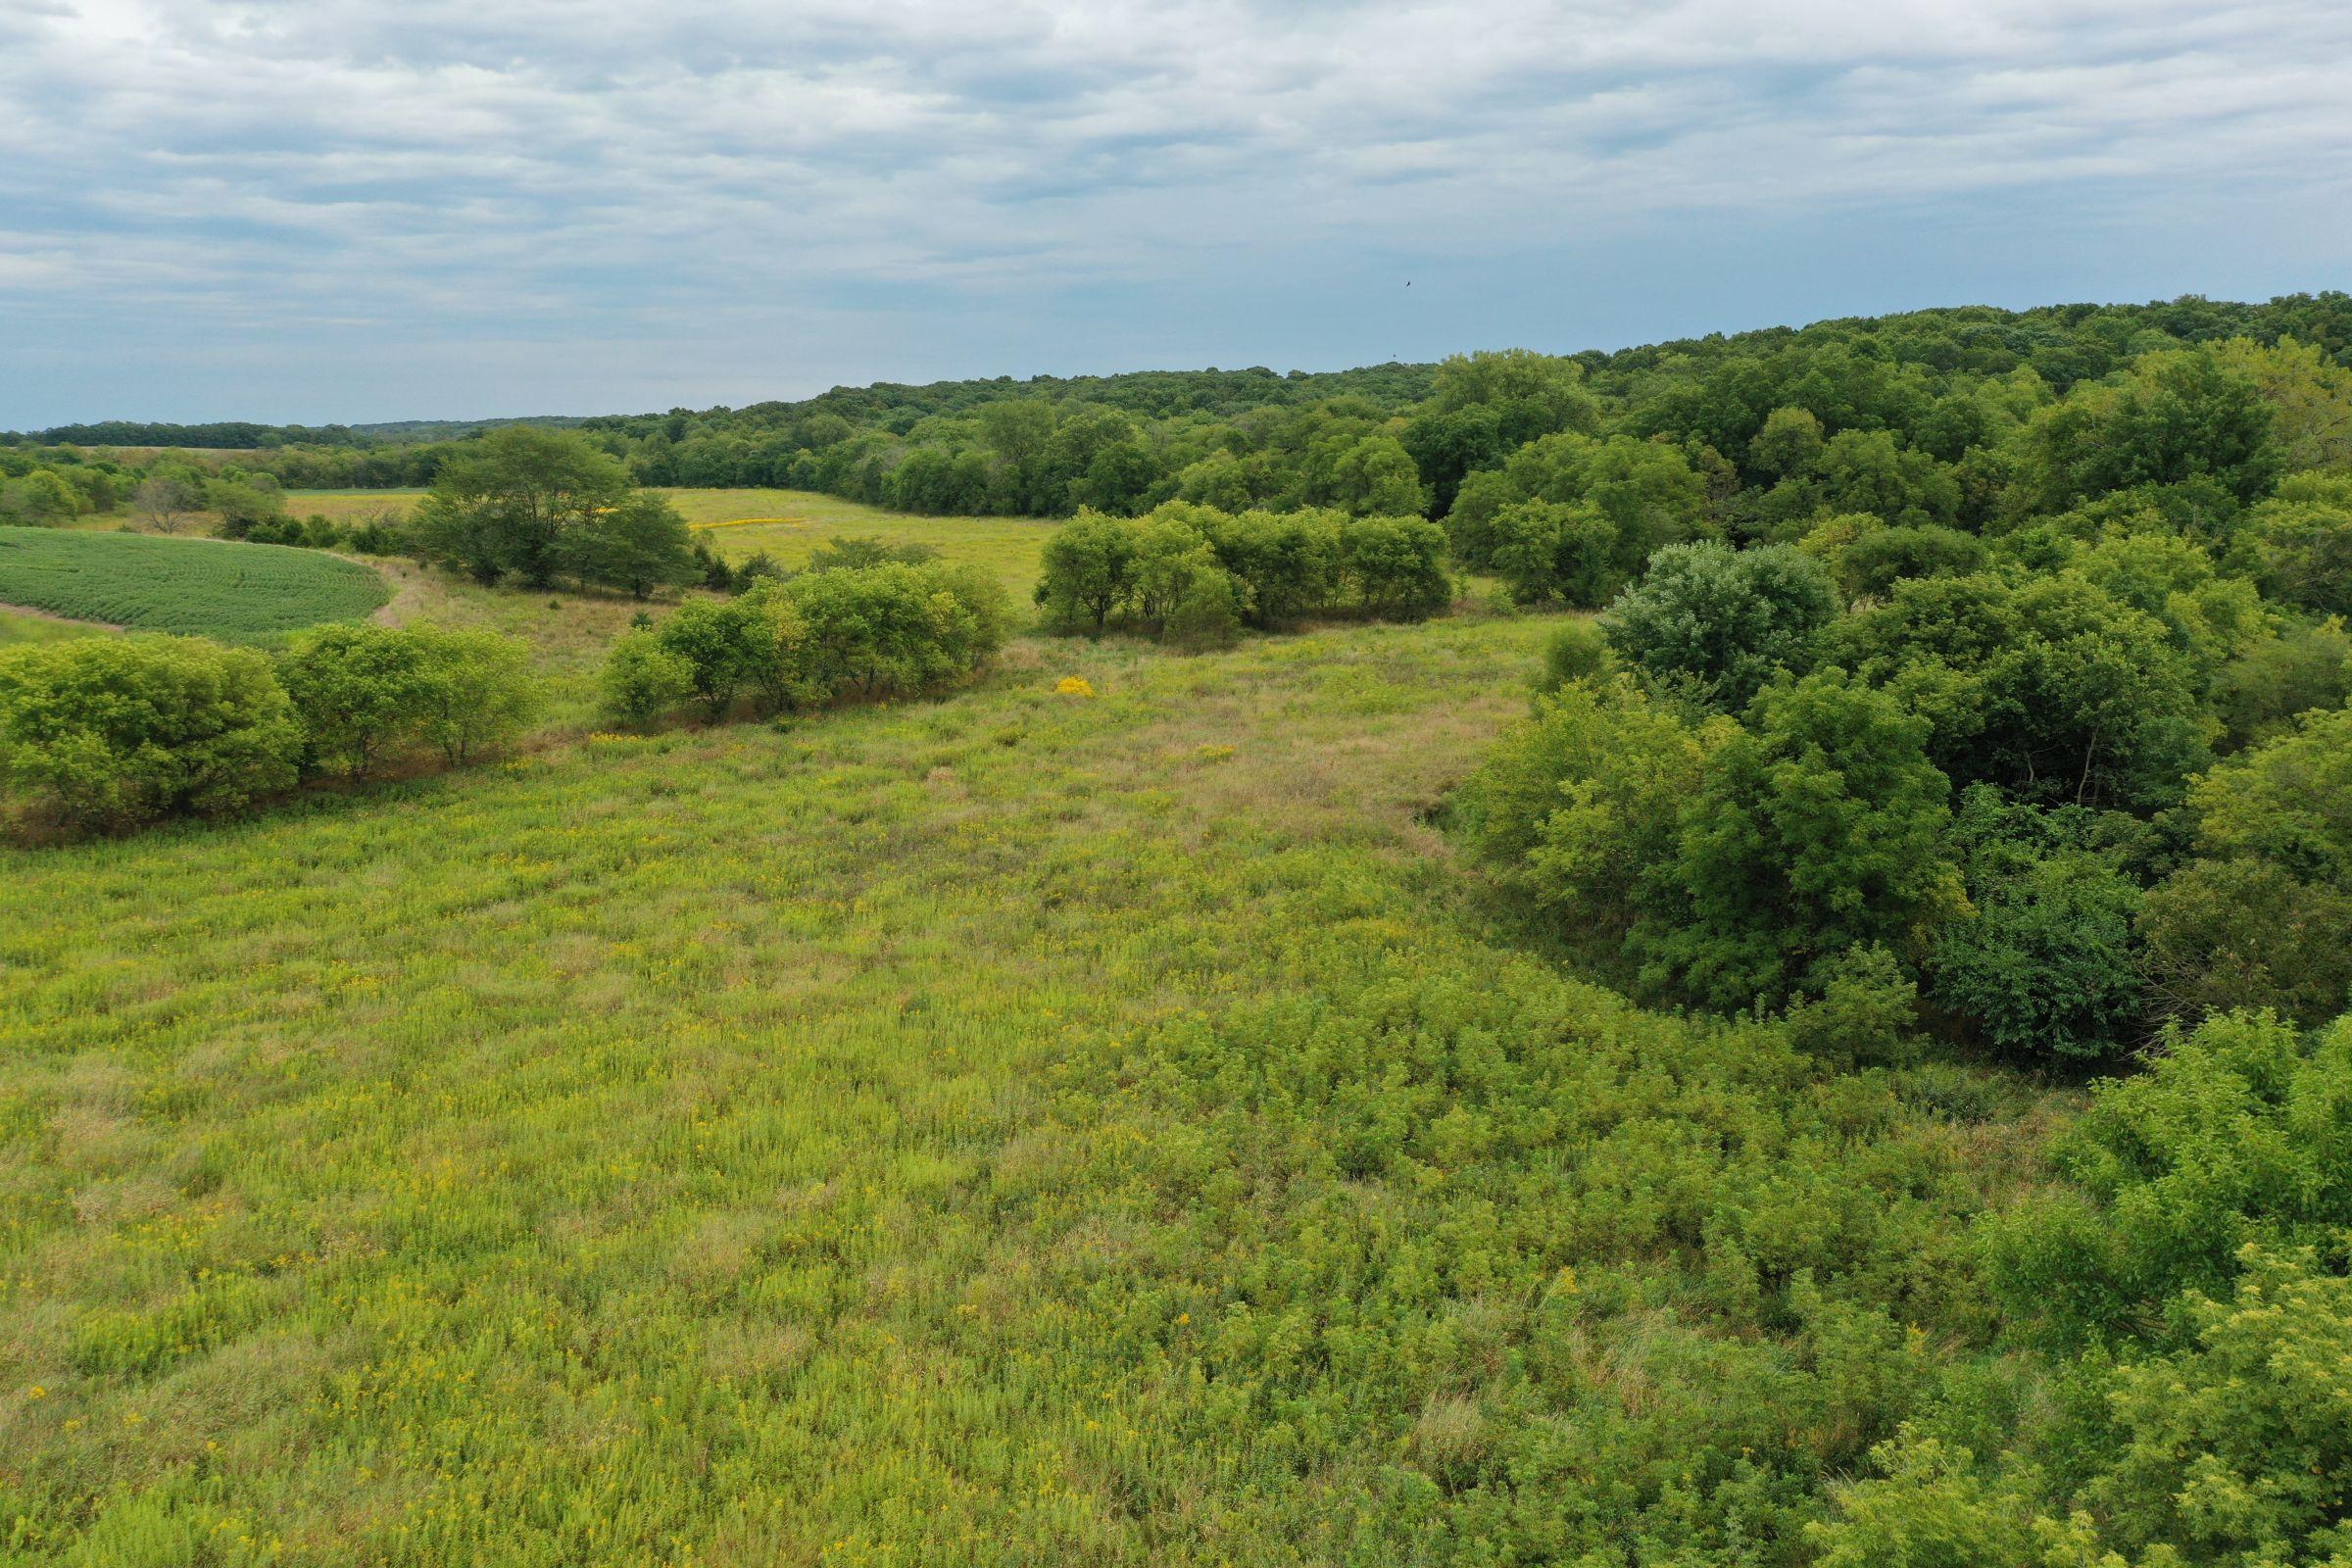 land-clarke-county-iowa-86-acres-listing-number-15147-2-2020-09-02-143151.jpg